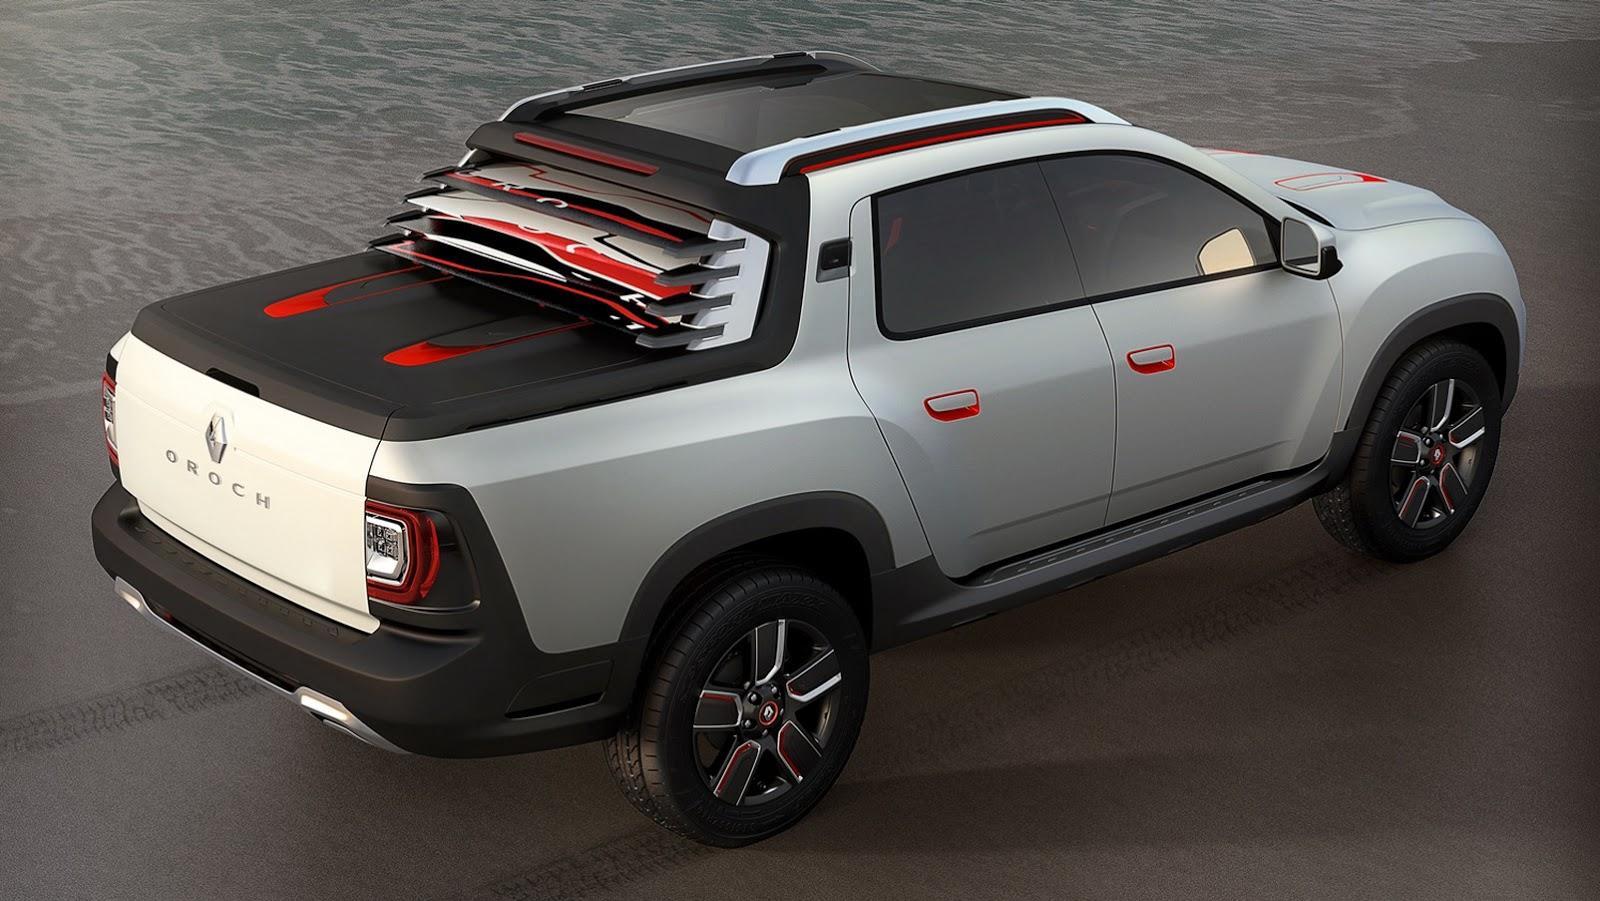 Renault Duster Oroch Concept Is a 4-Door Pickup [Video